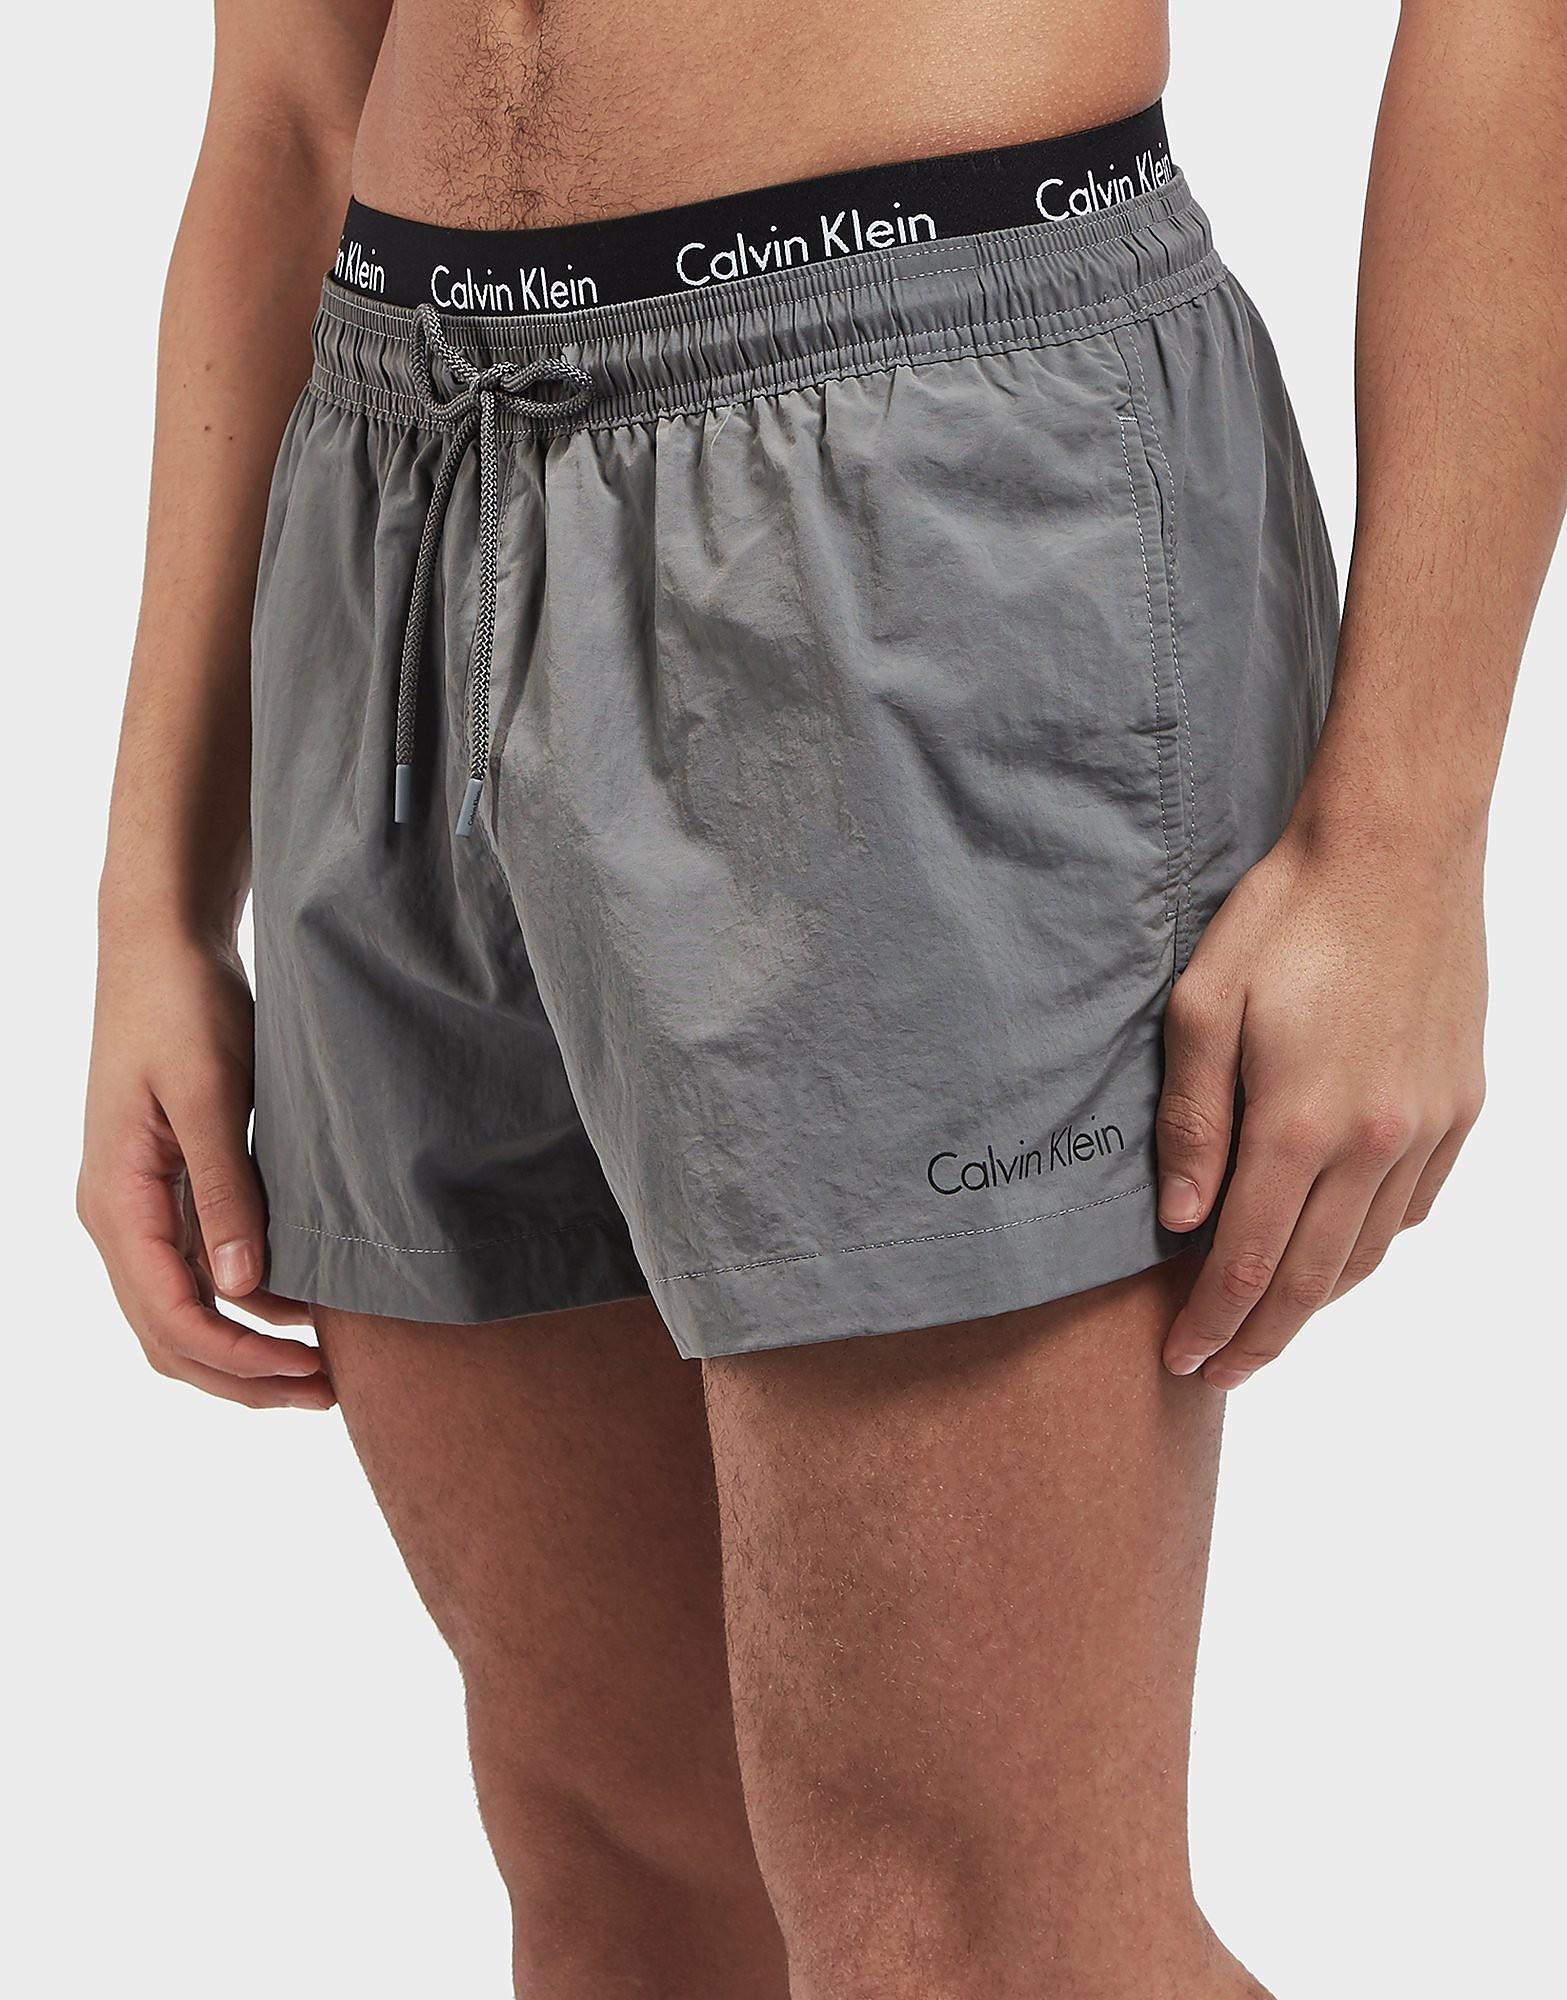 Calvin Klein Waist Band Swim Shorts